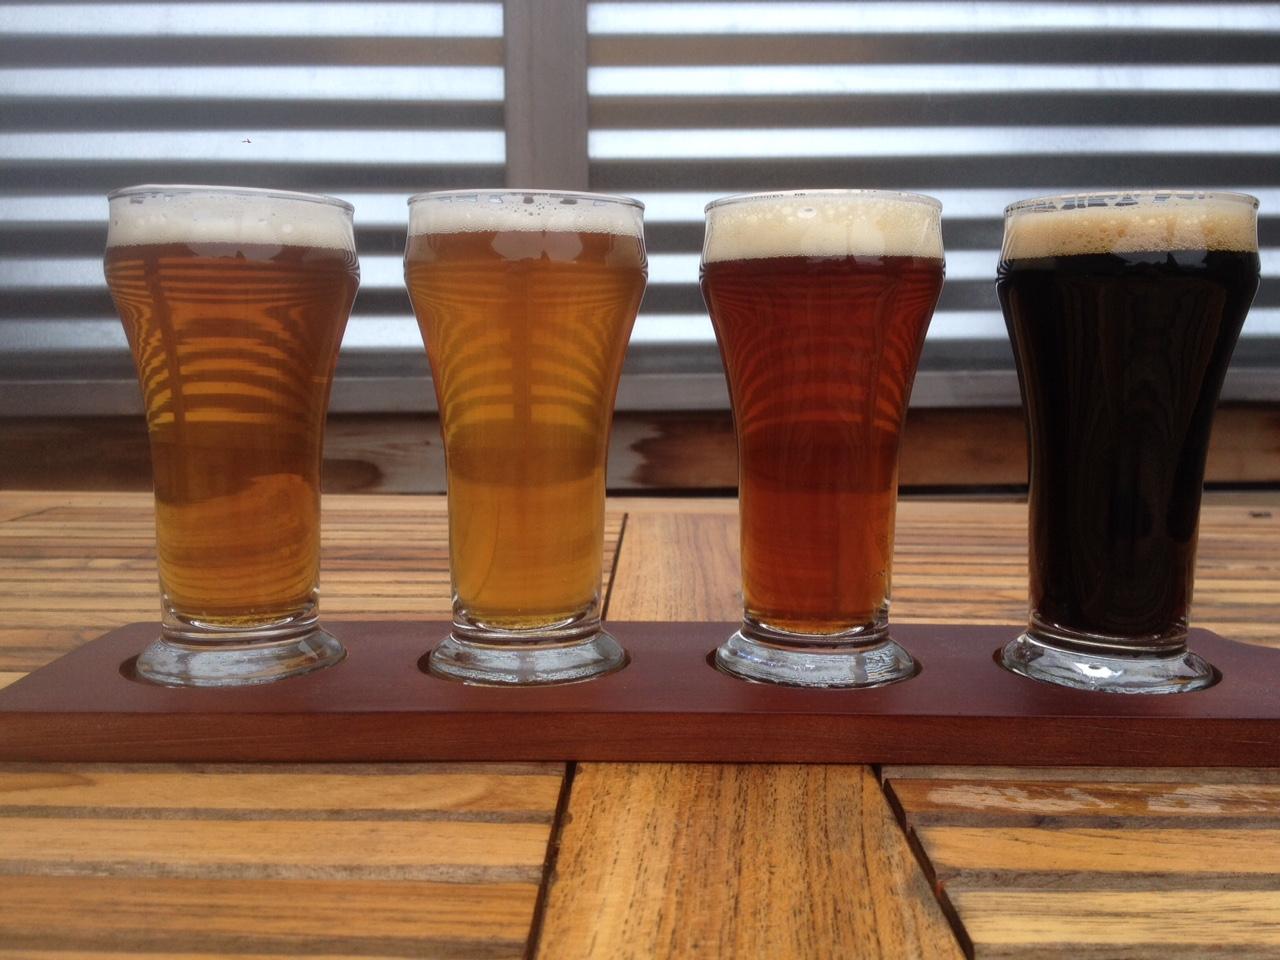 Island Hoppin' Brewery Beer